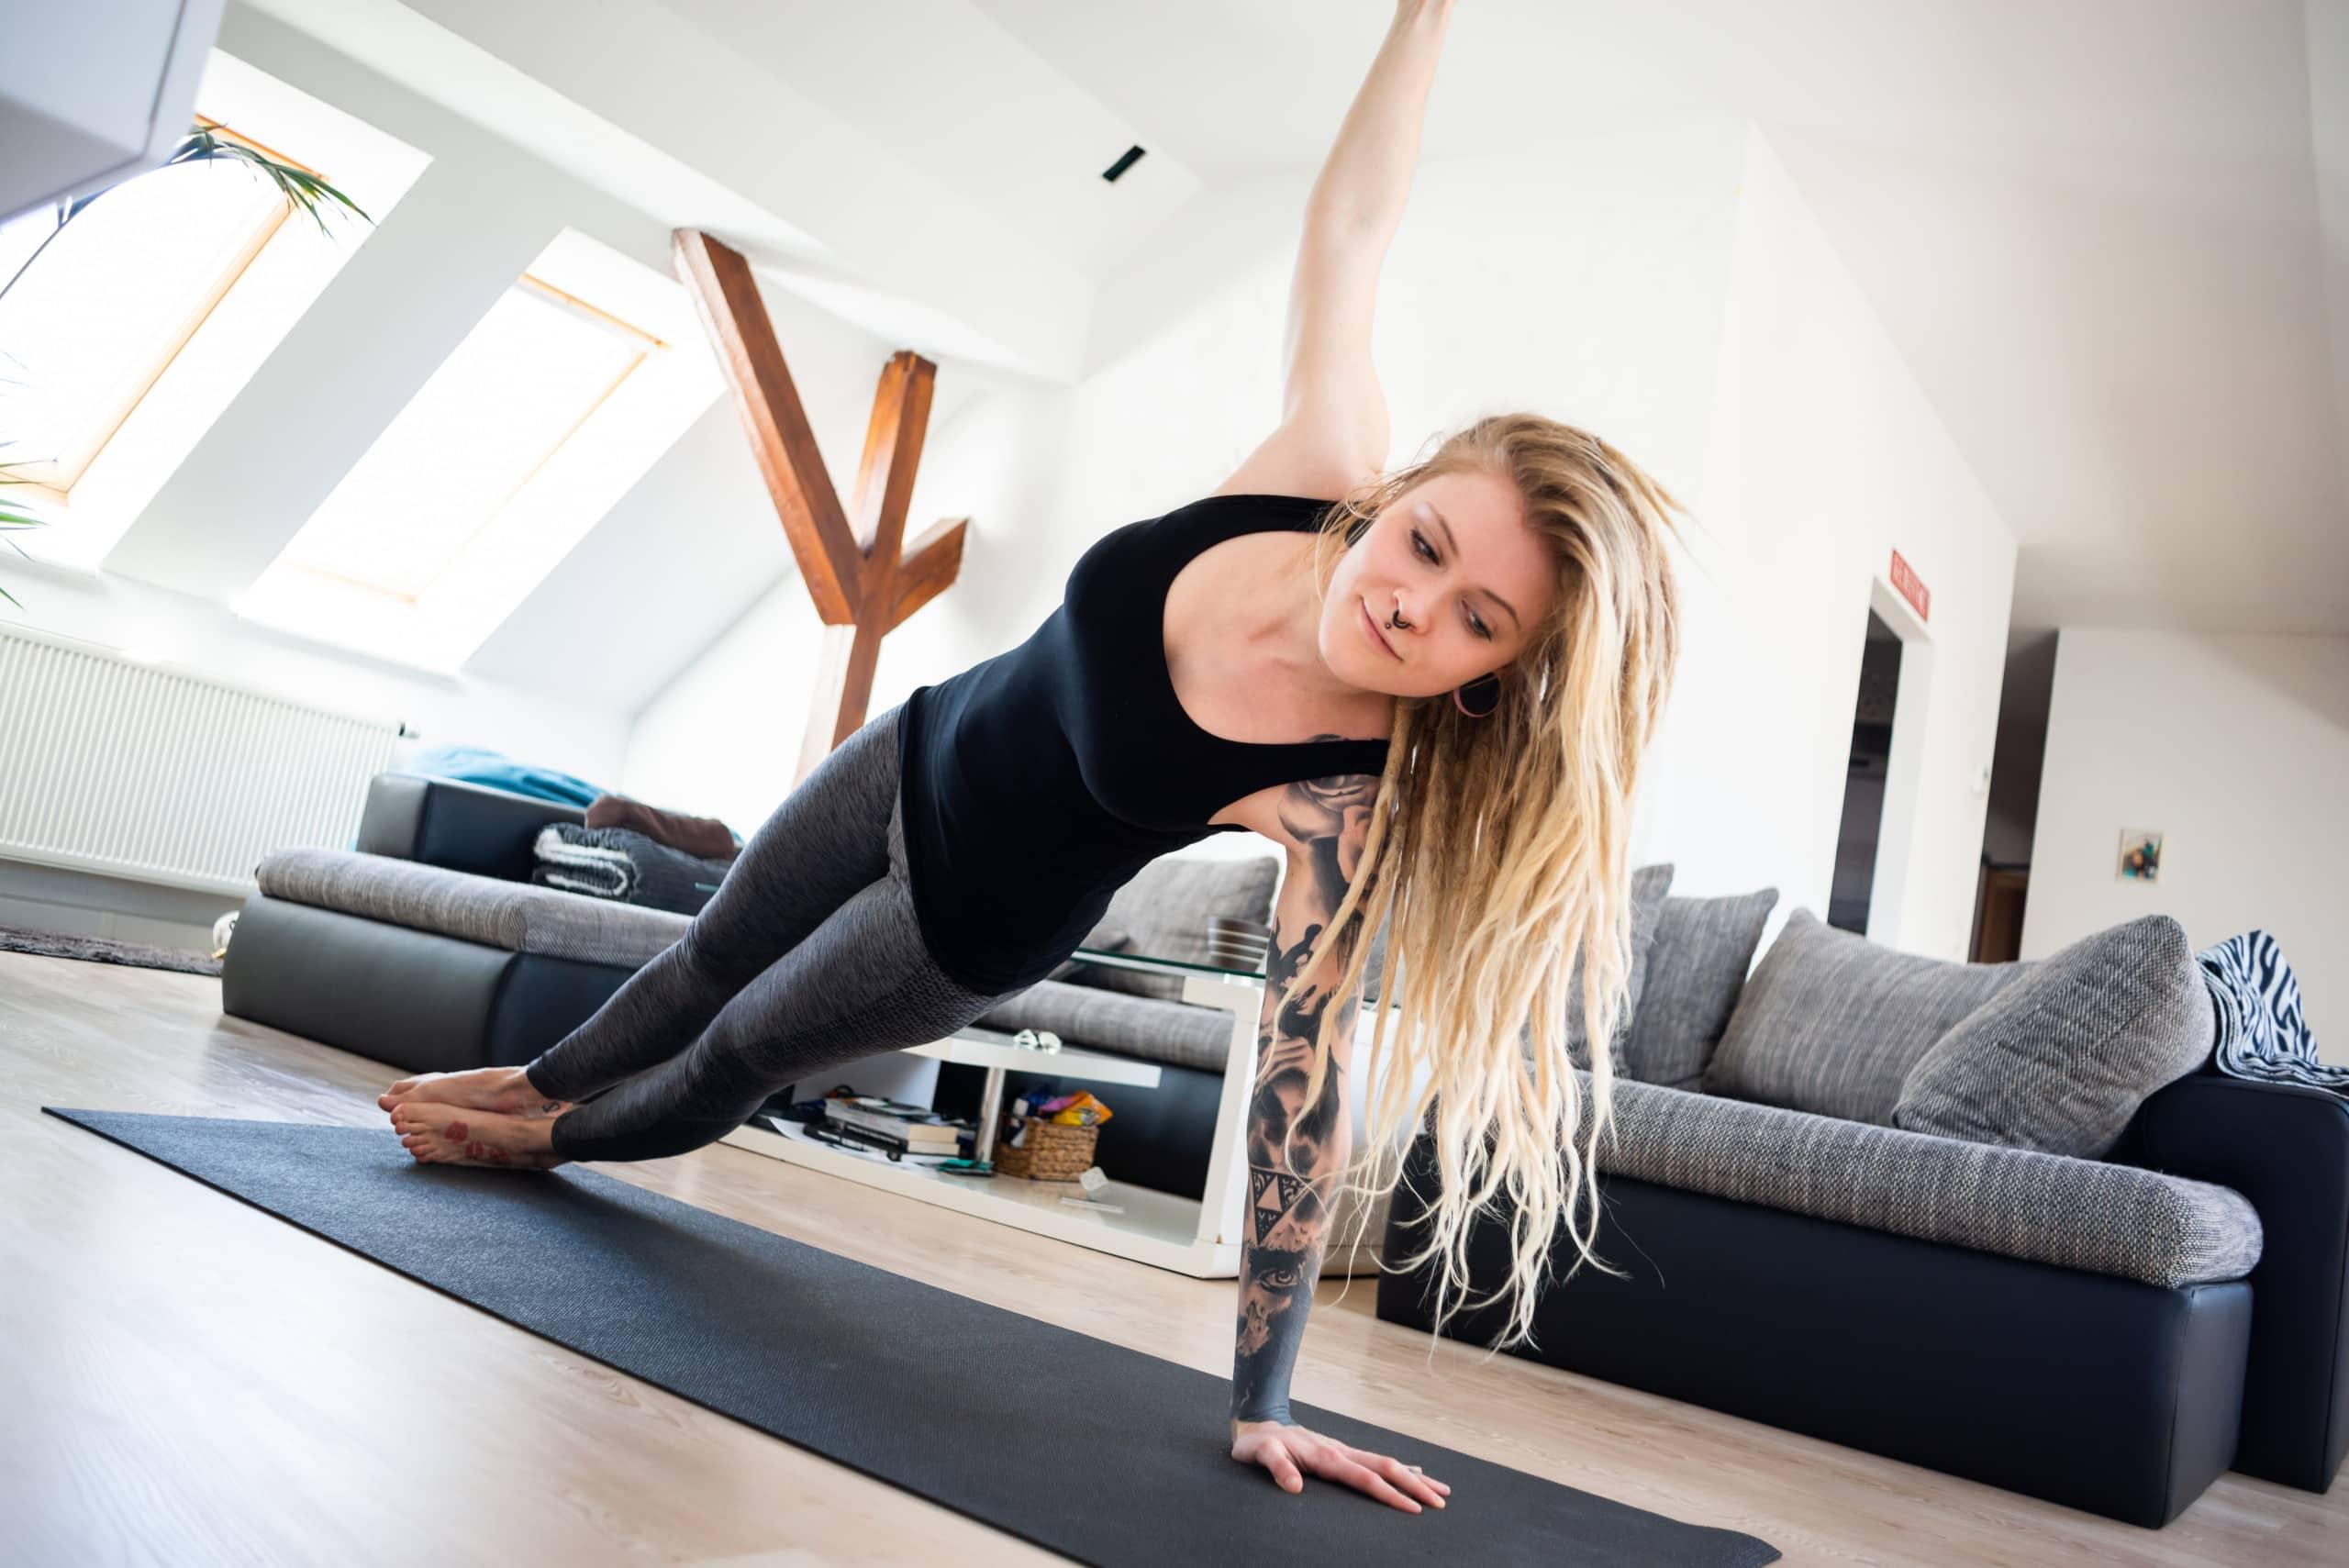 Junge Frau macht Yoga zuhause